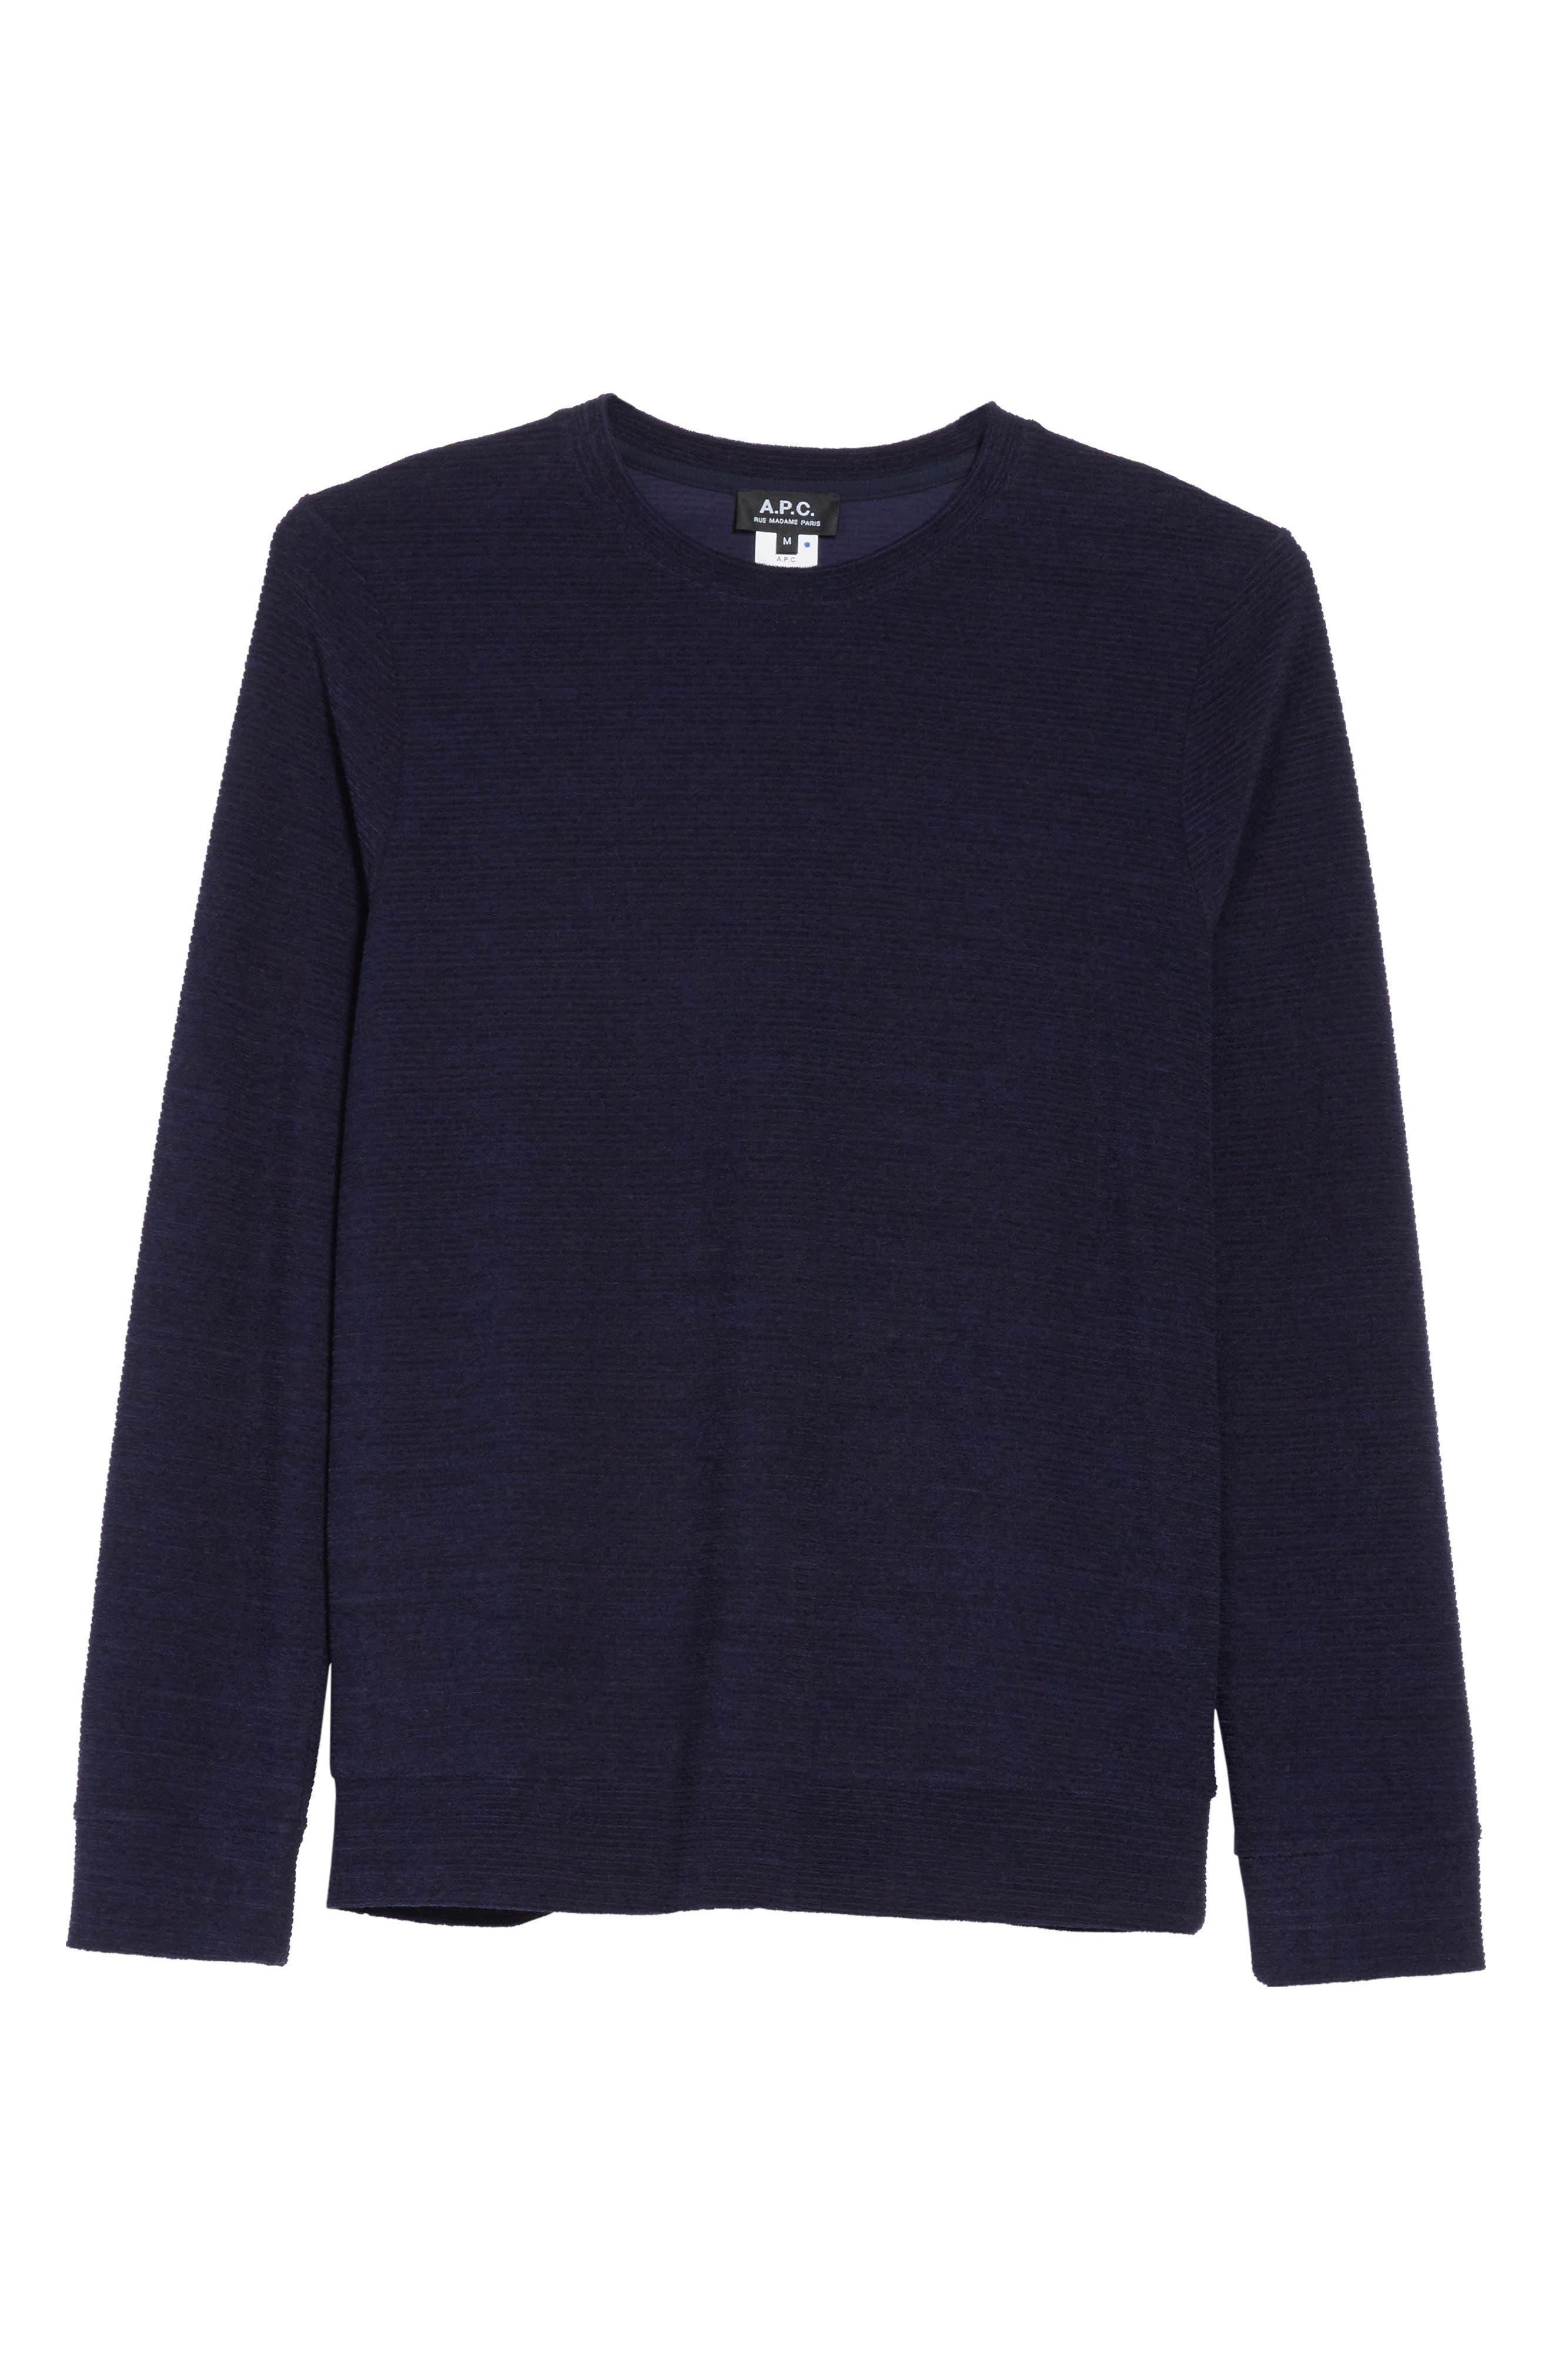 Jeremie Crewneck Sweater,                             Alternate thumbnail 6, color,                             Marine